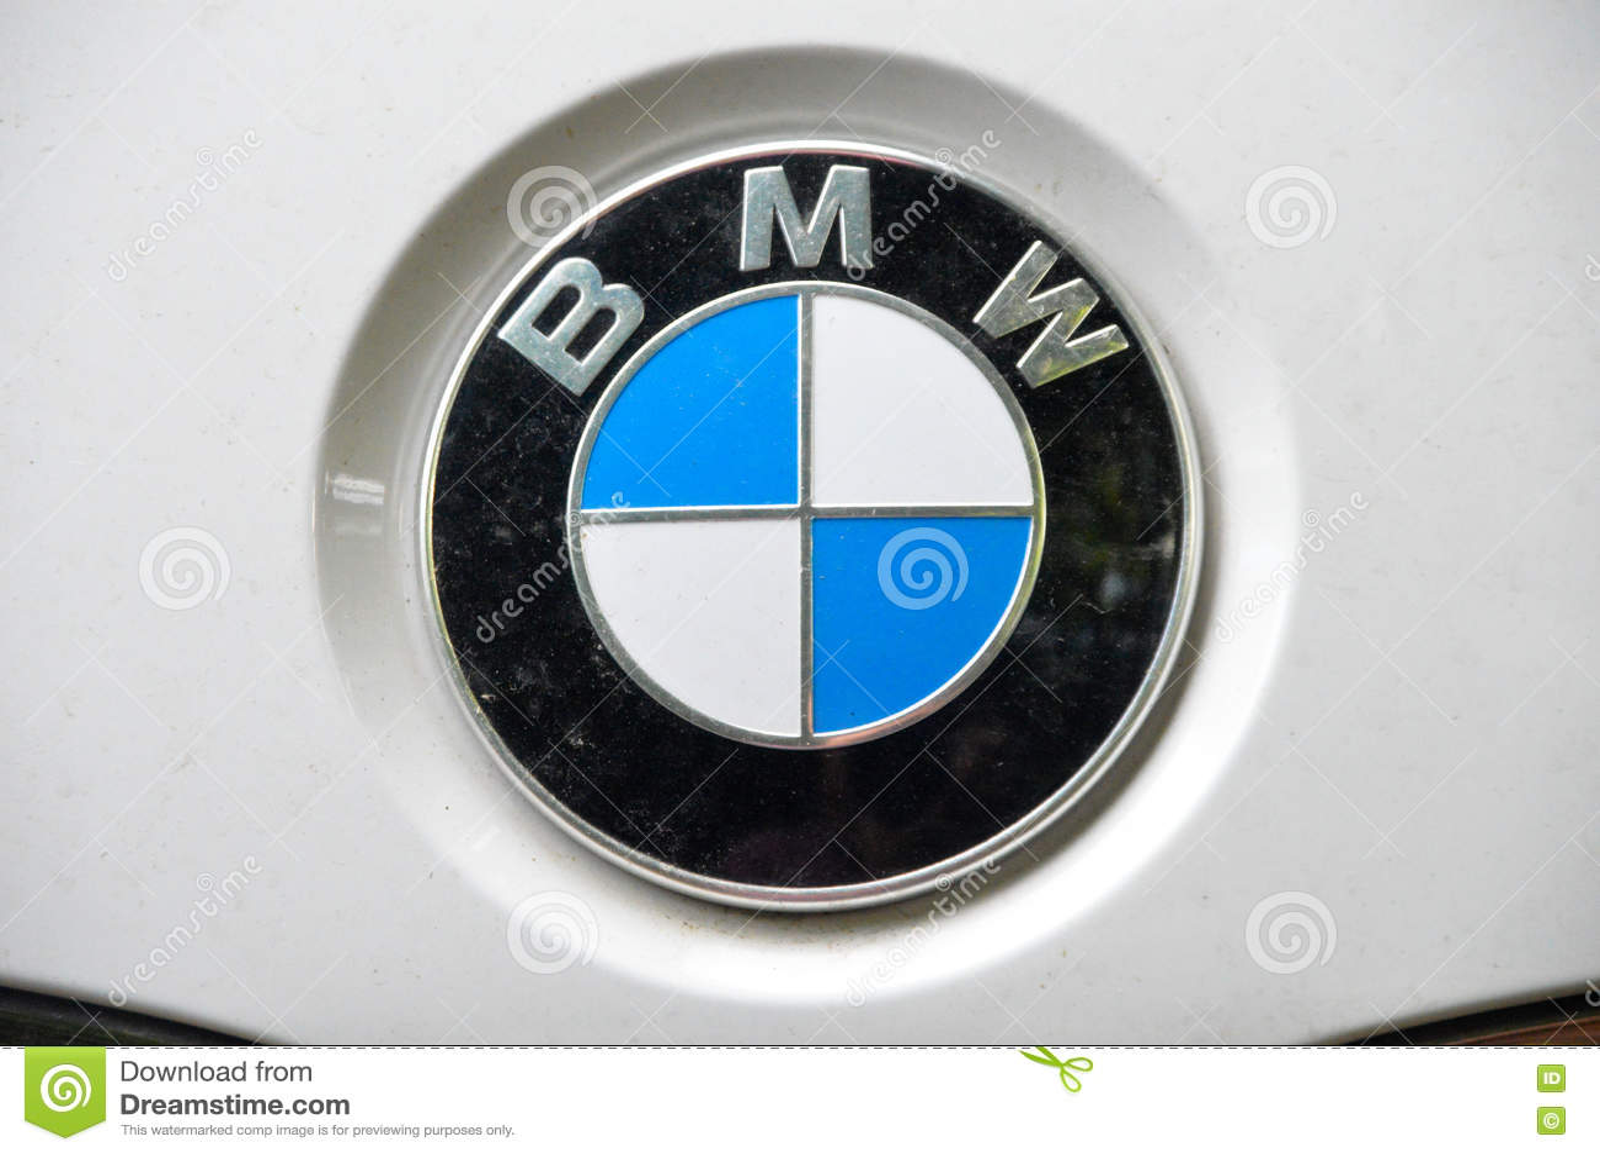 Bmw Metal Symbol Editorial Stock Image Image Of Auto 74131189